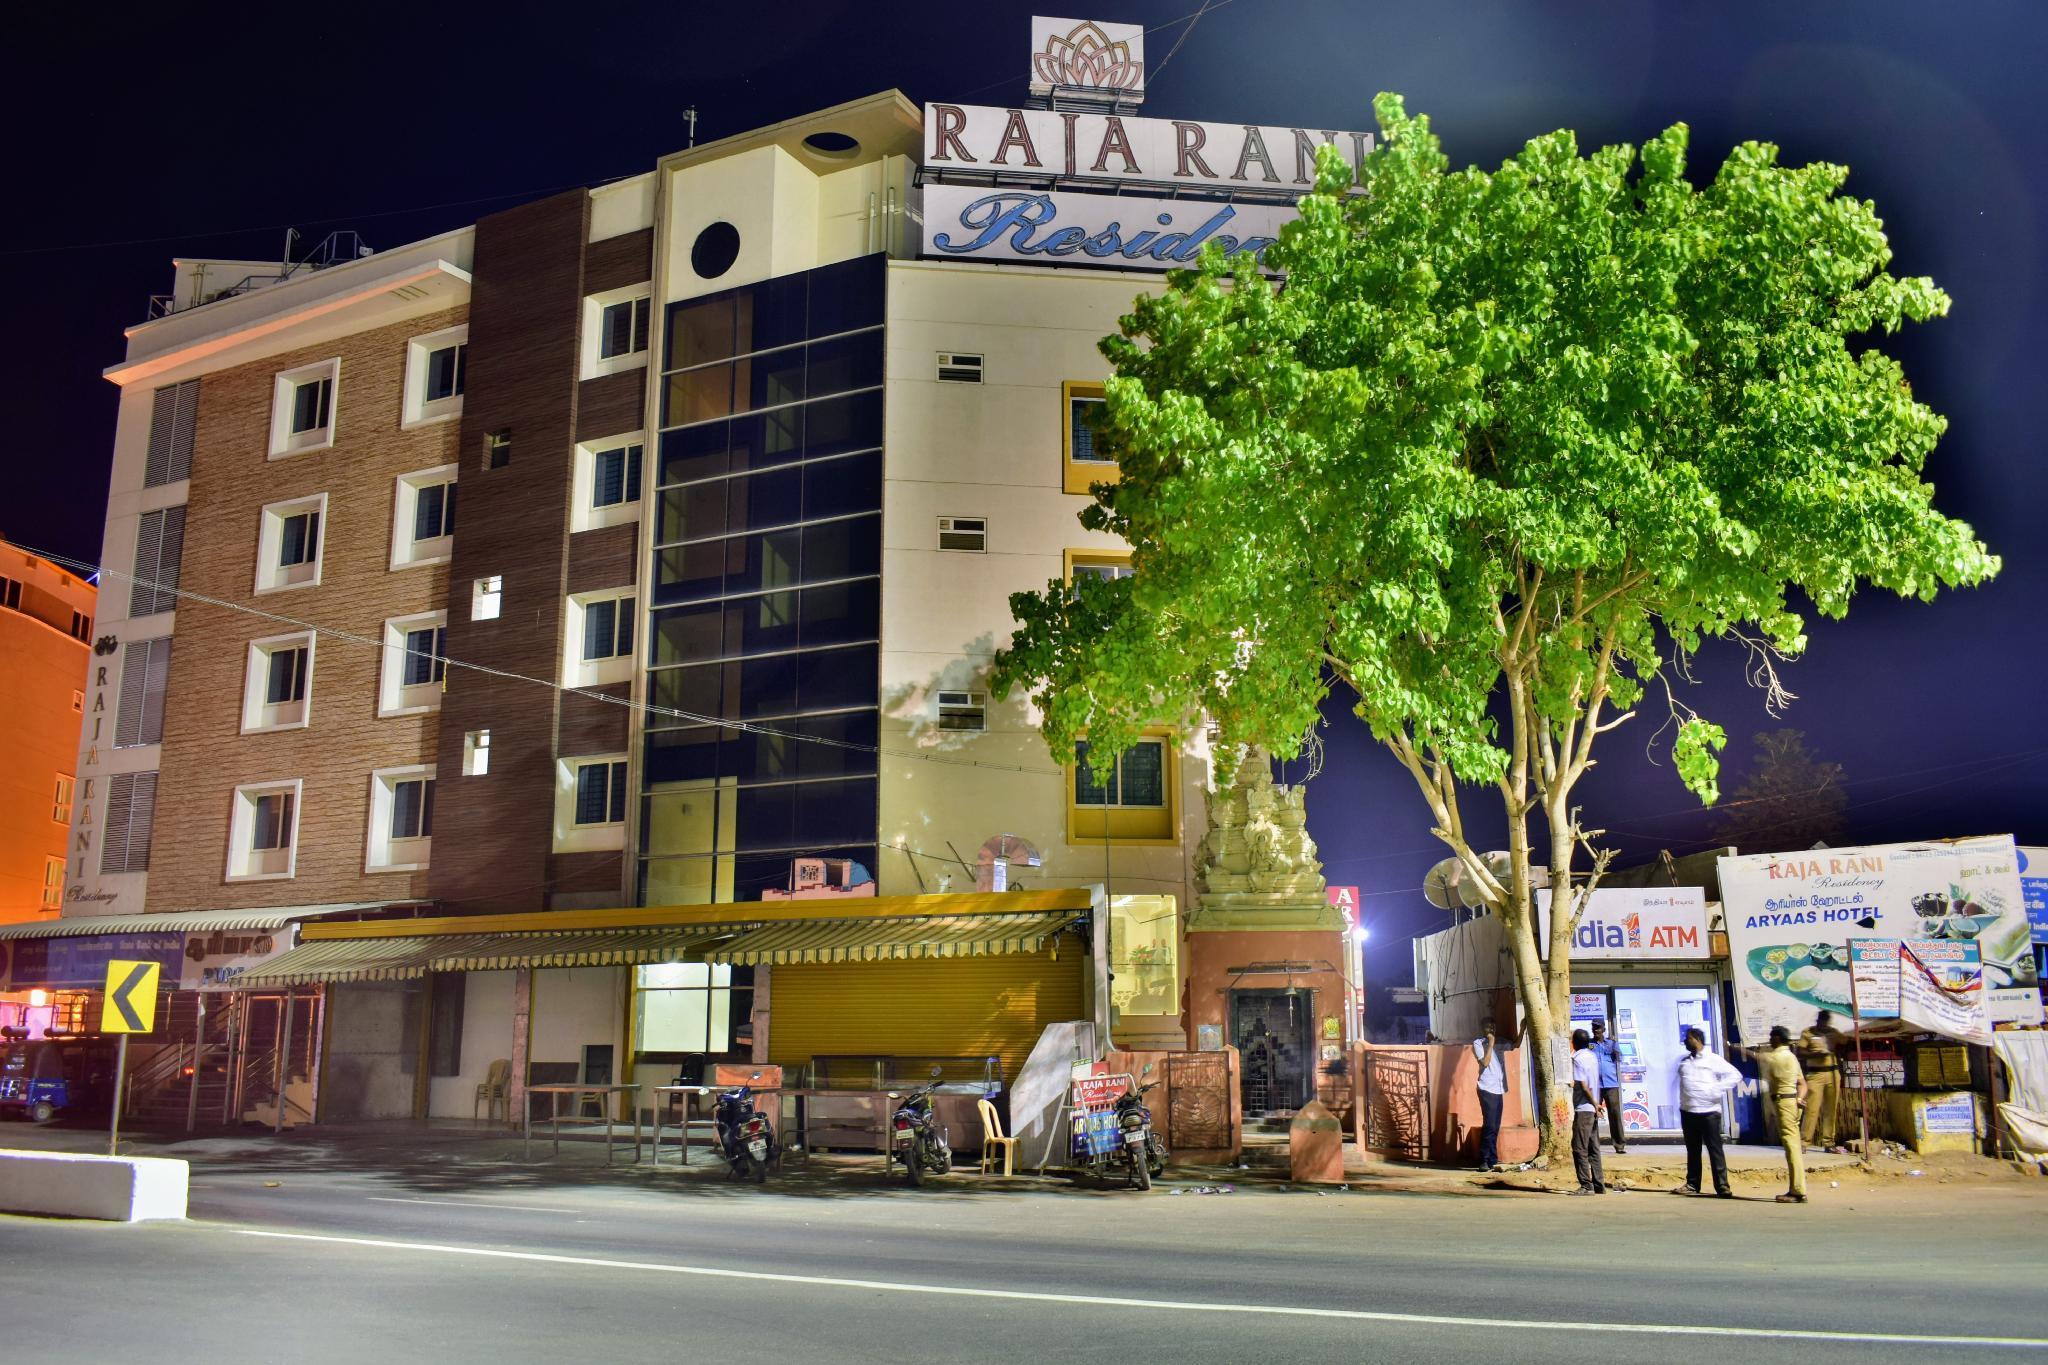 Hotel Raja Rani Residency, Vellore